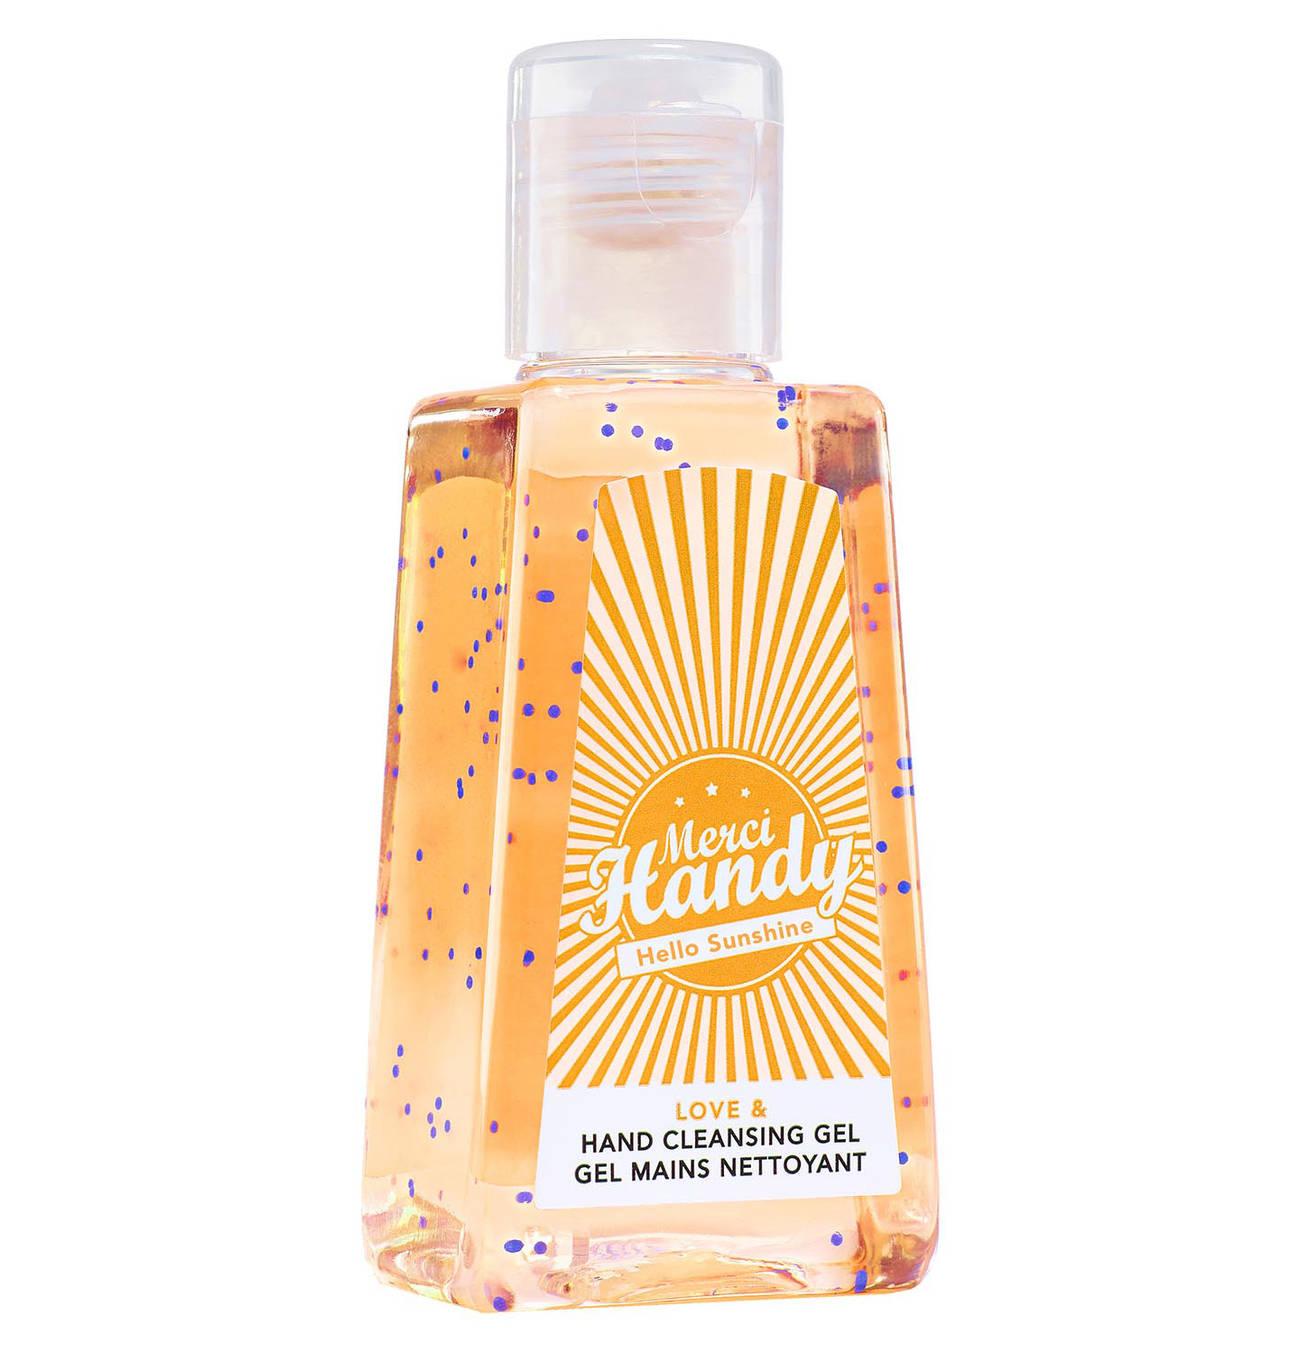 Handgel Handpflege Flakon Und Vitamin E